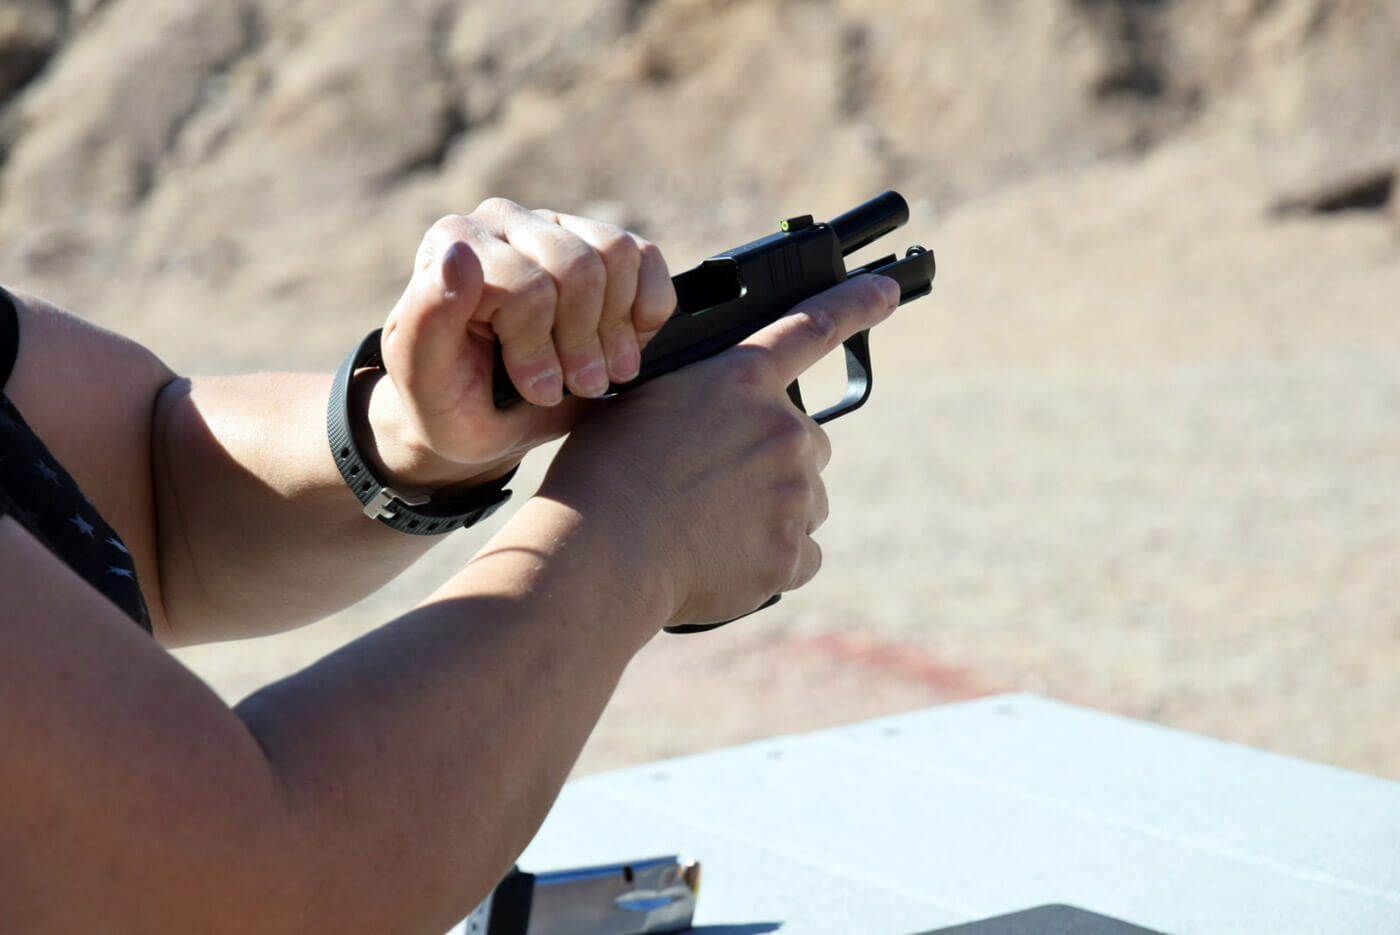 Working the handgun slide